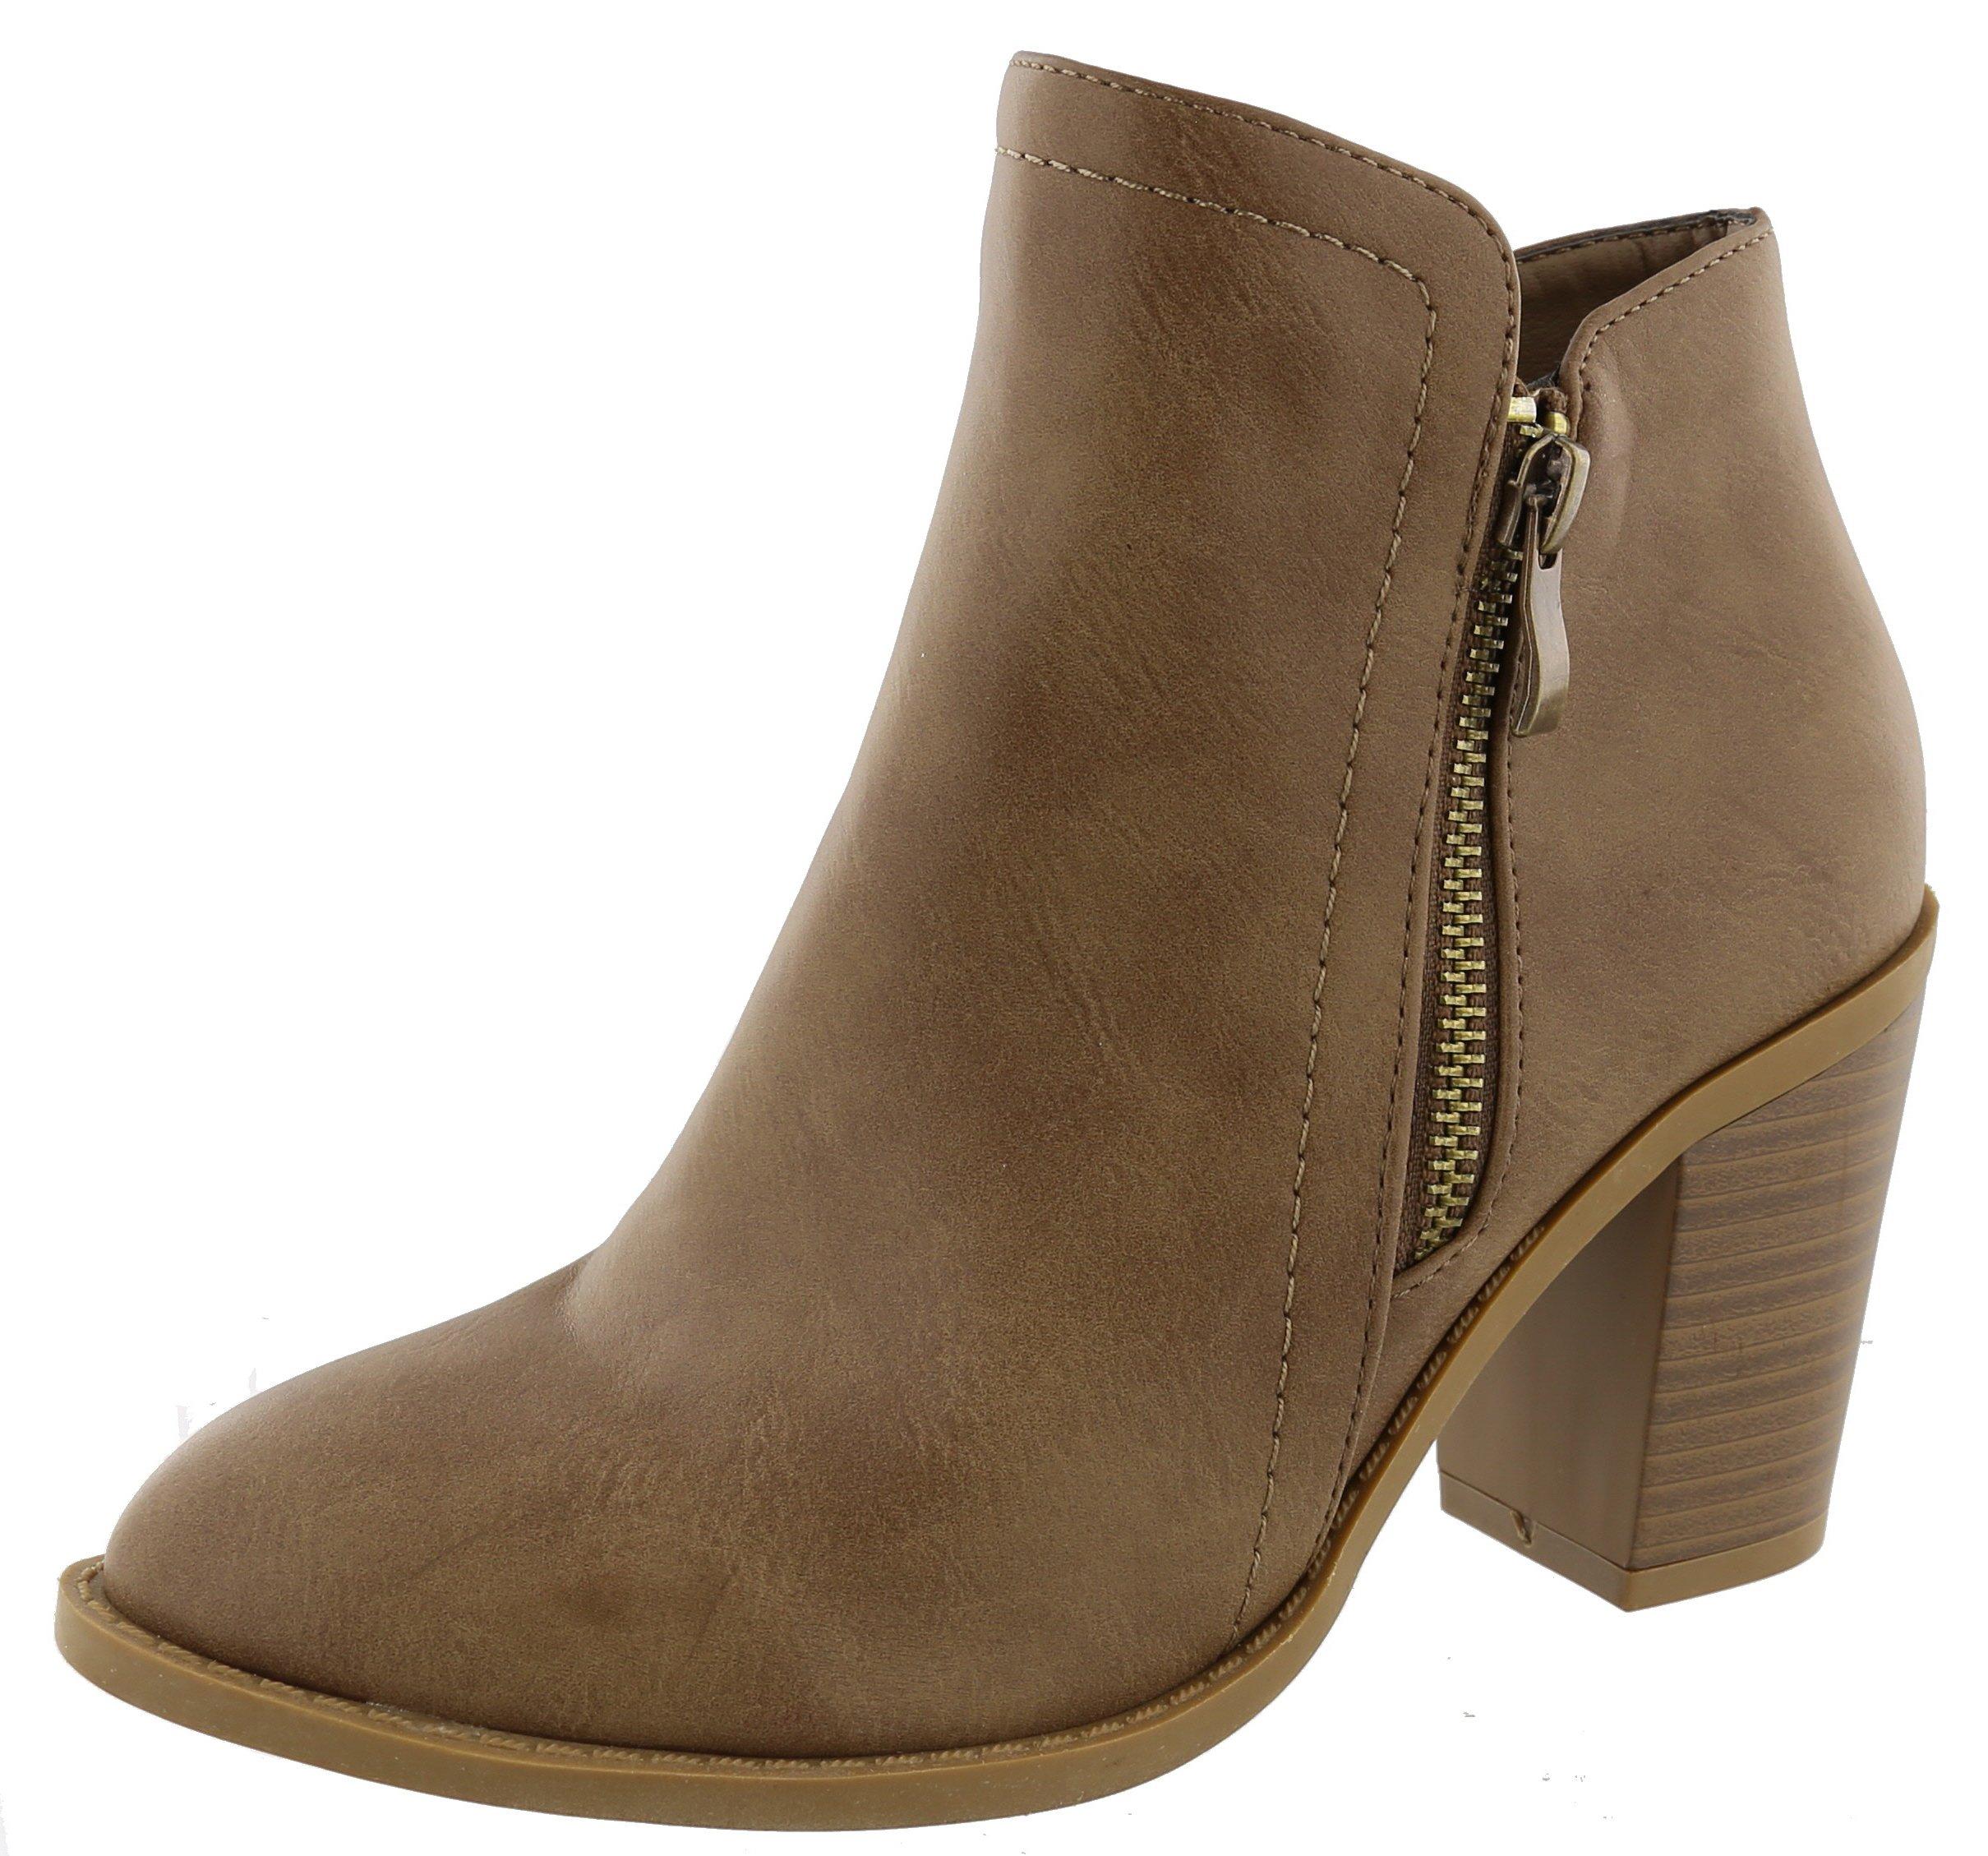 Top Moda Women's Closed Round Toe Zipper Chunky Stacked Block Heel Ankle Bootie (7.5 B(M) US, Khaki)